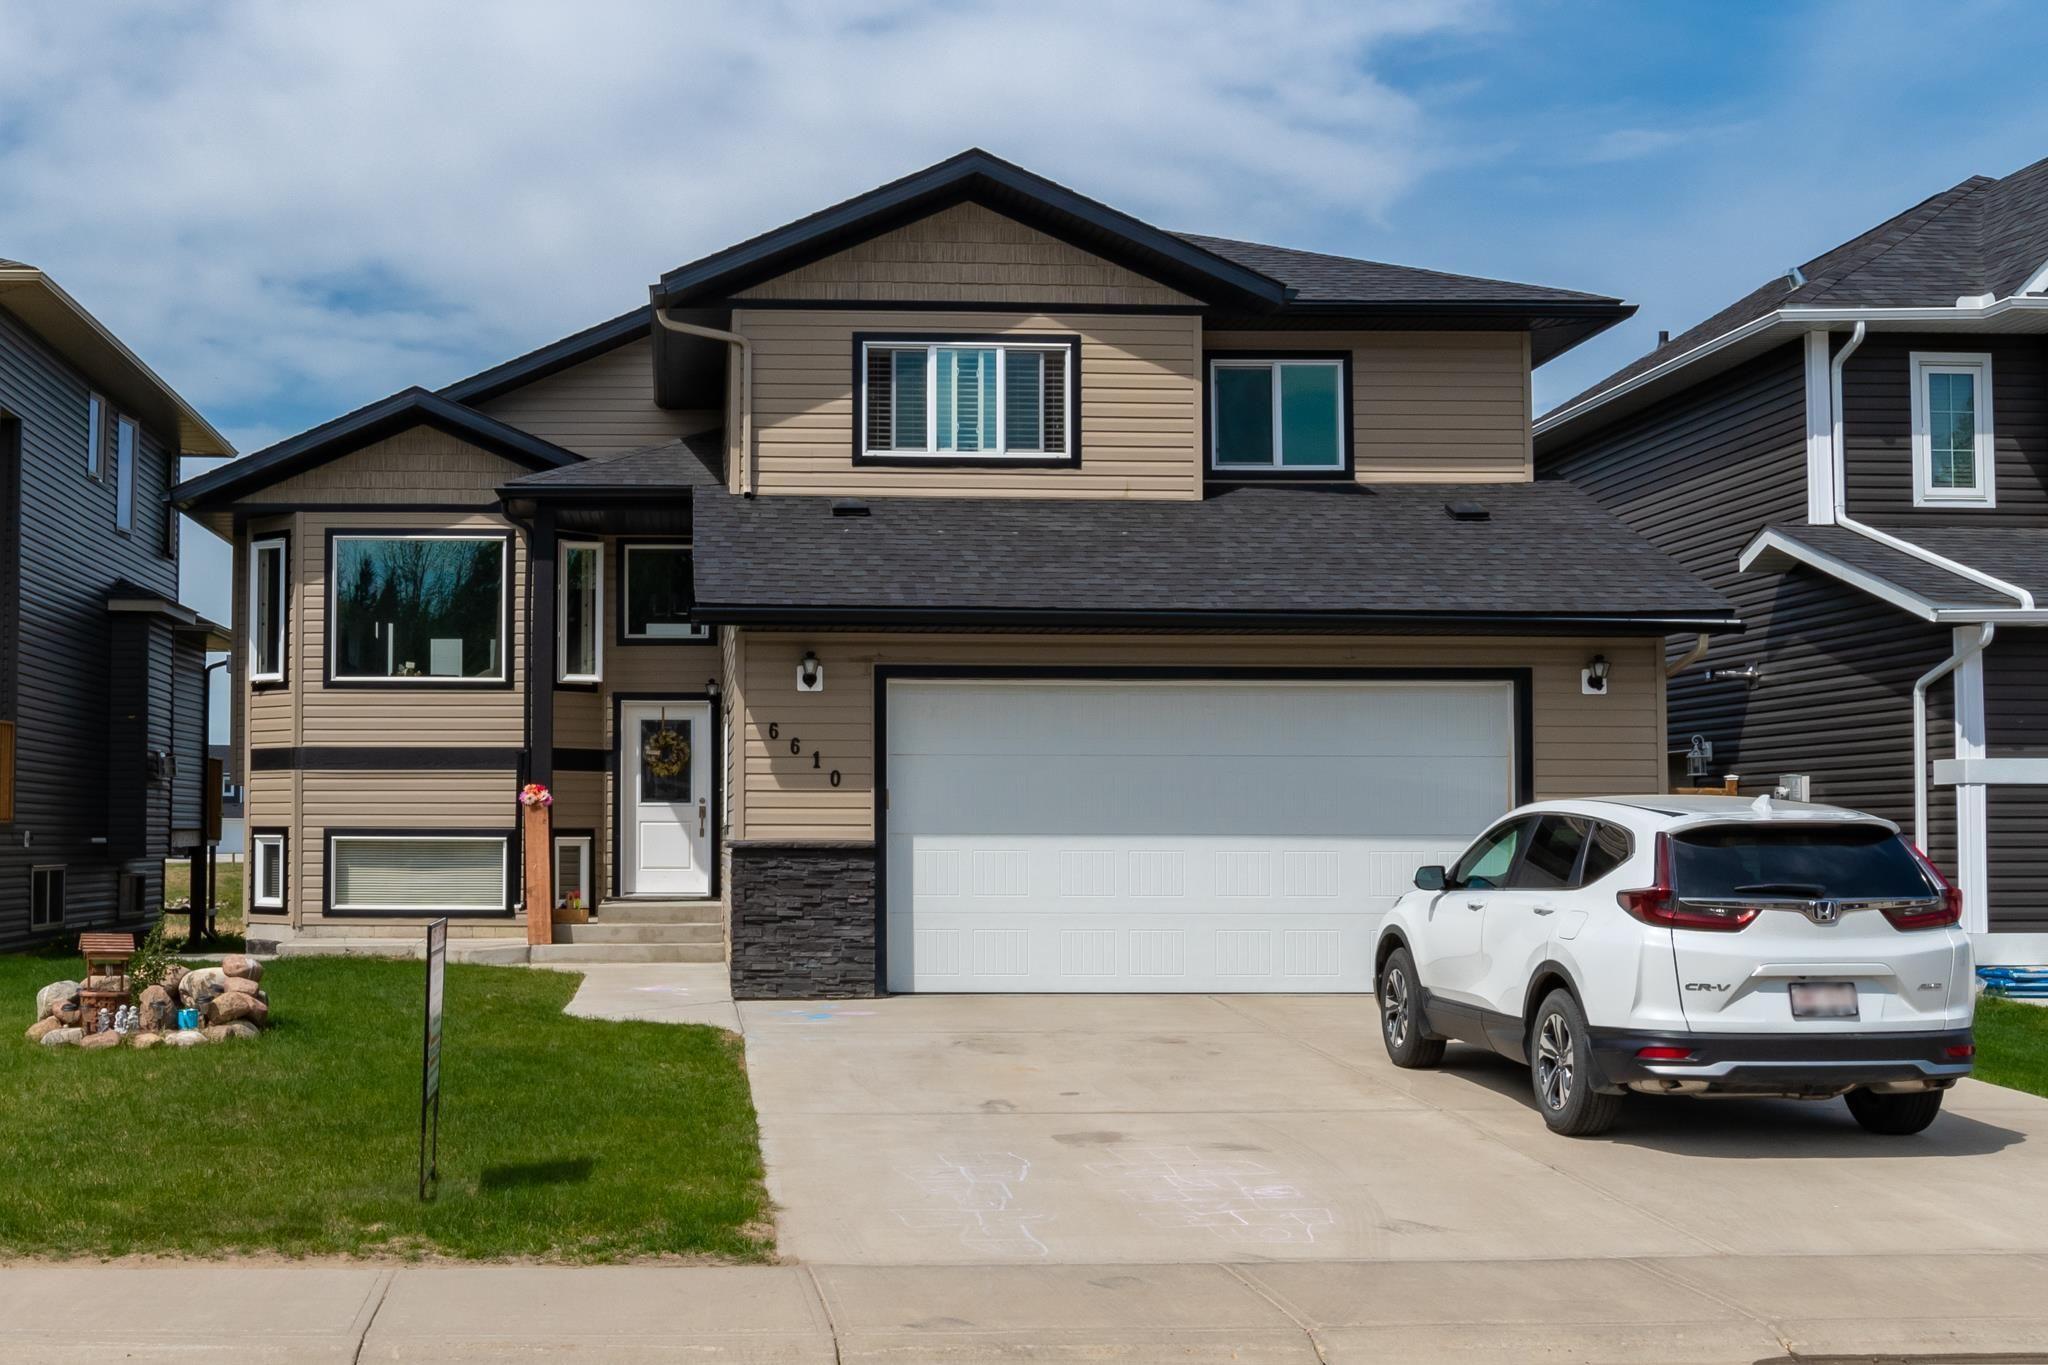 Main Photo: 6610 Tri City Way: Cold Lake House for sale : MLS®# E4236257